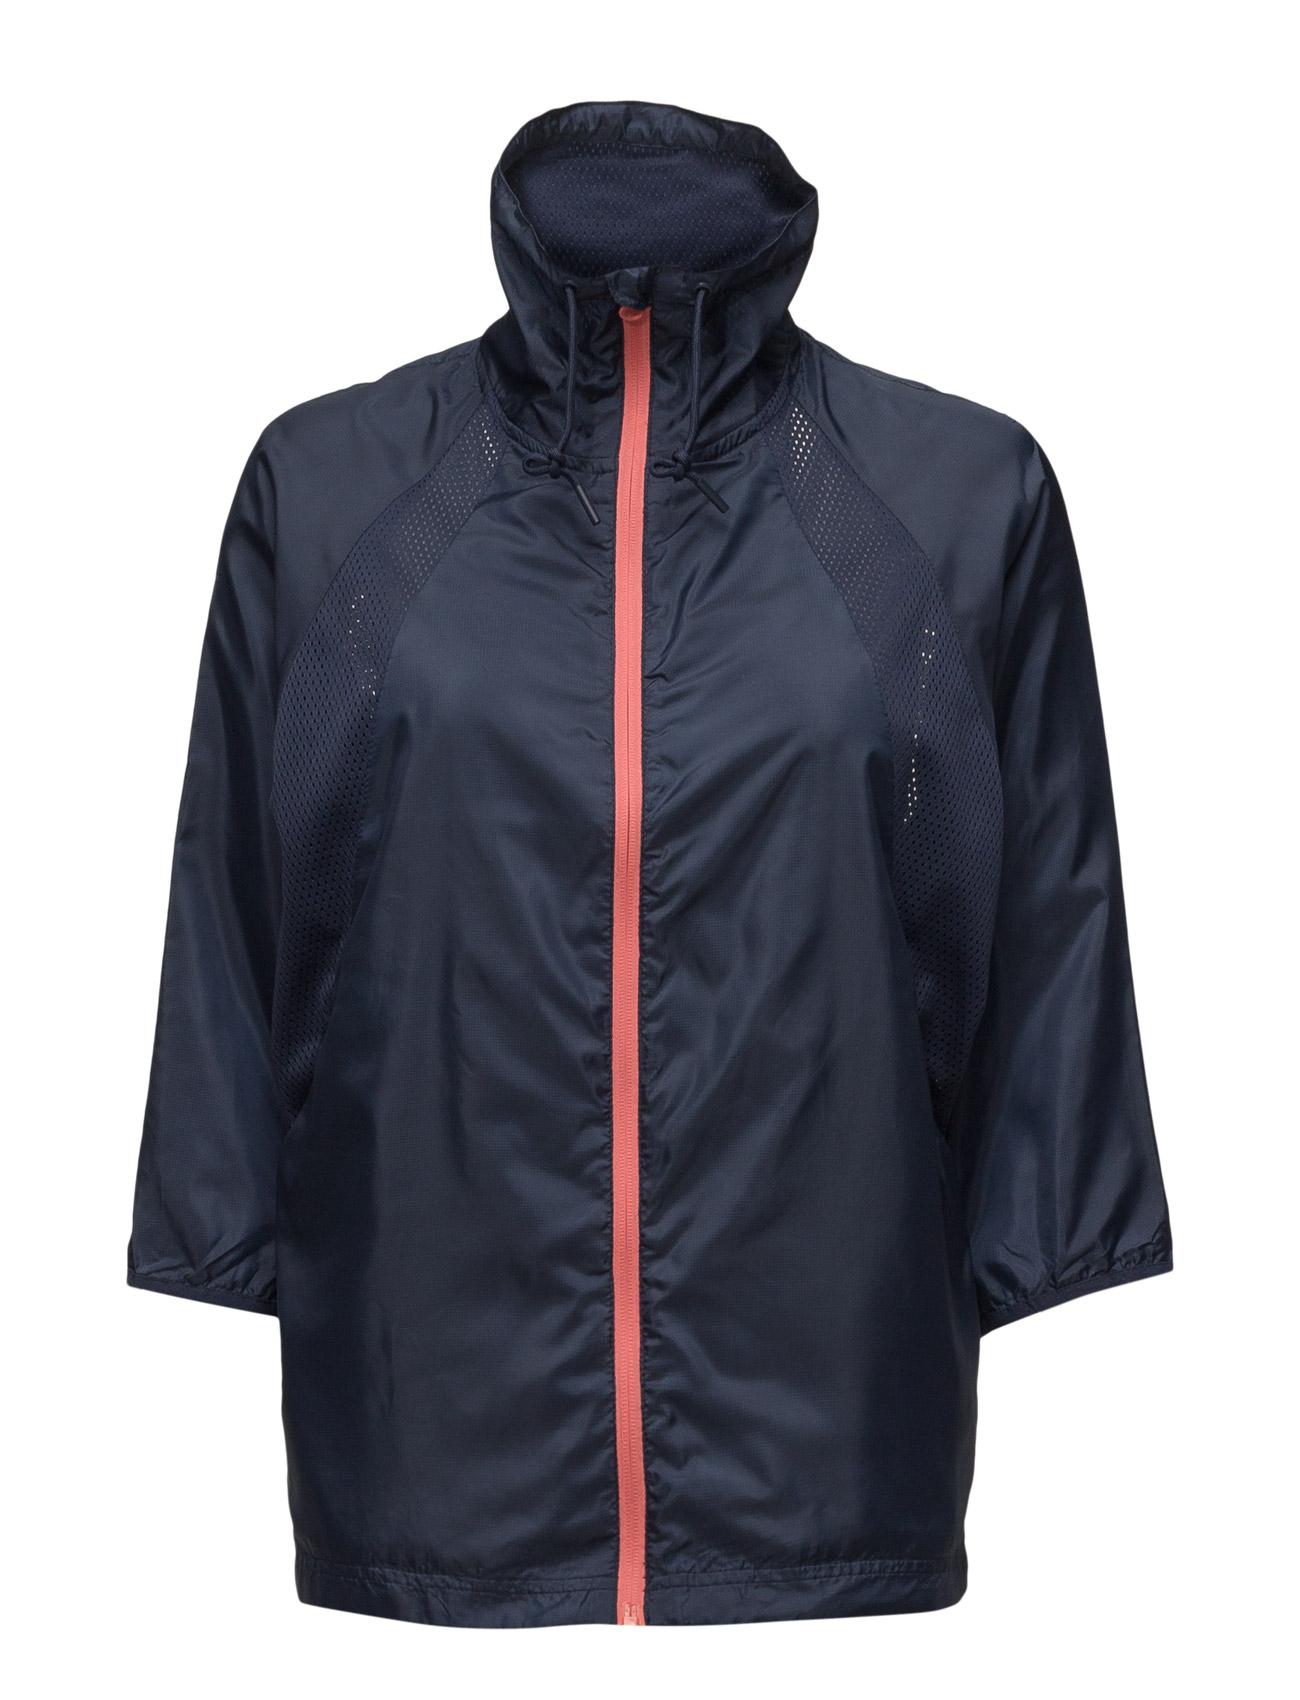 Jackets Outdoor Woven Esprit Casual Sports toppe til Damer i Navy blå